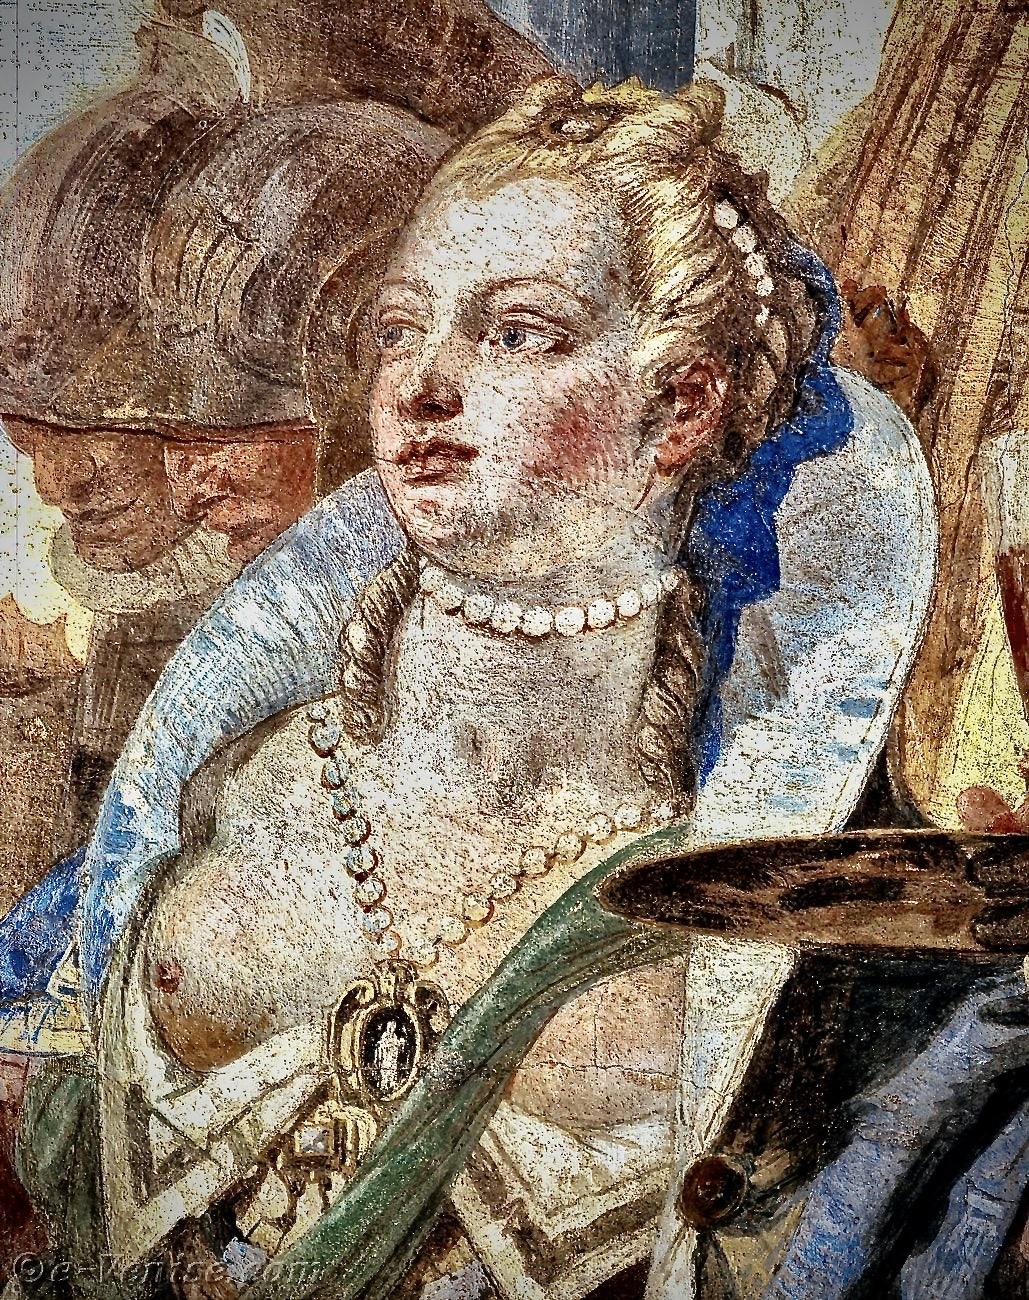 giambattista-tiepolo-cleopatre-palazzo-labia-venise-italie-01